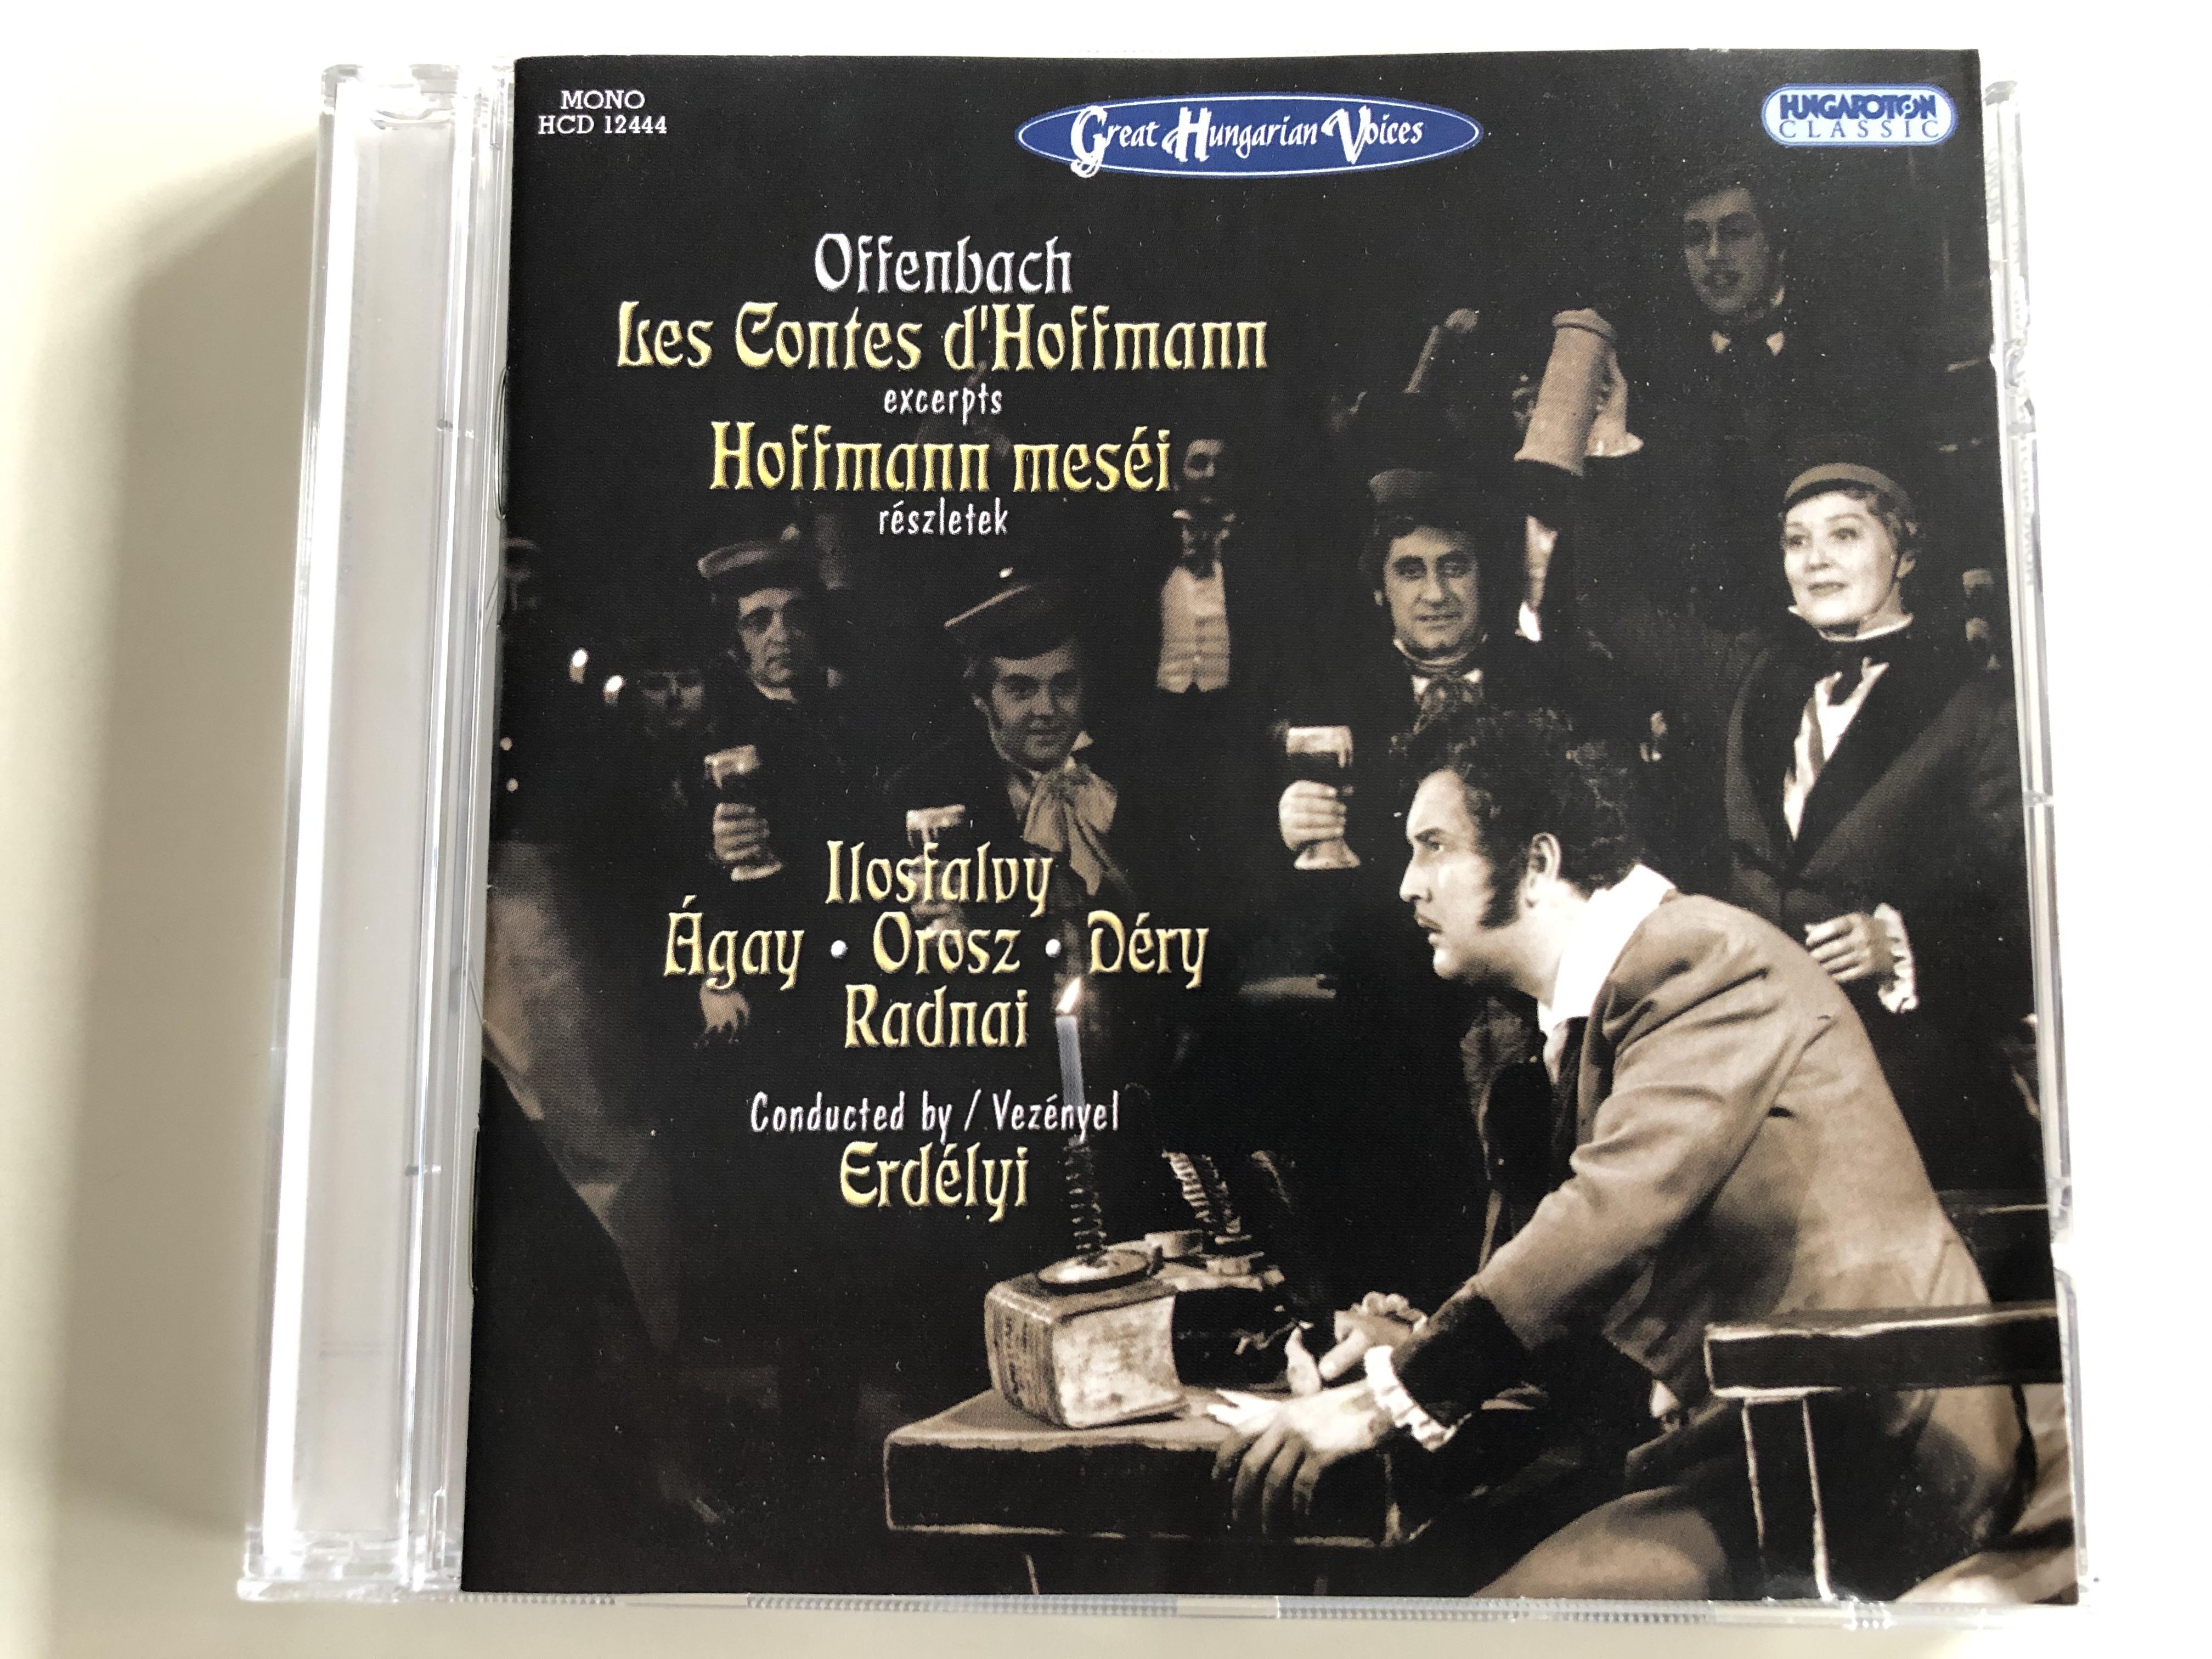 offenbach-les-contes-d-hoffmann-excerpts-hoffmann-mesei-reszletek-ilosfalvy-agay-orosz-dery-radnai-conducted-by-erdelyi-hungaroton-classic-audio-cd-1983-mono-hcd-12444-1-.jpg